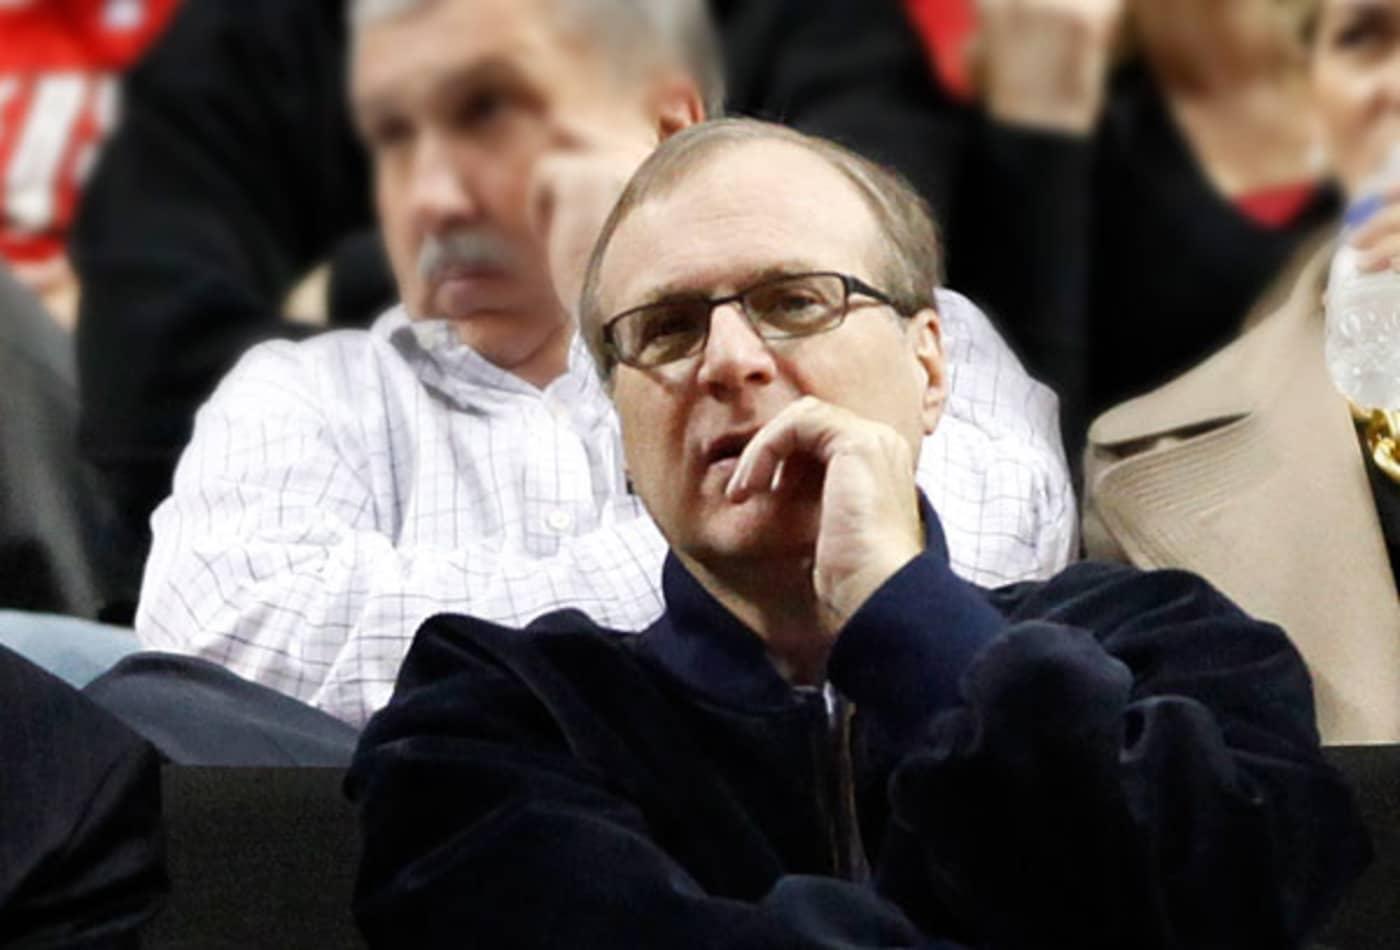 Paul-Allen-Billionaire-Sports-Team-Owners-CNBC.jpg